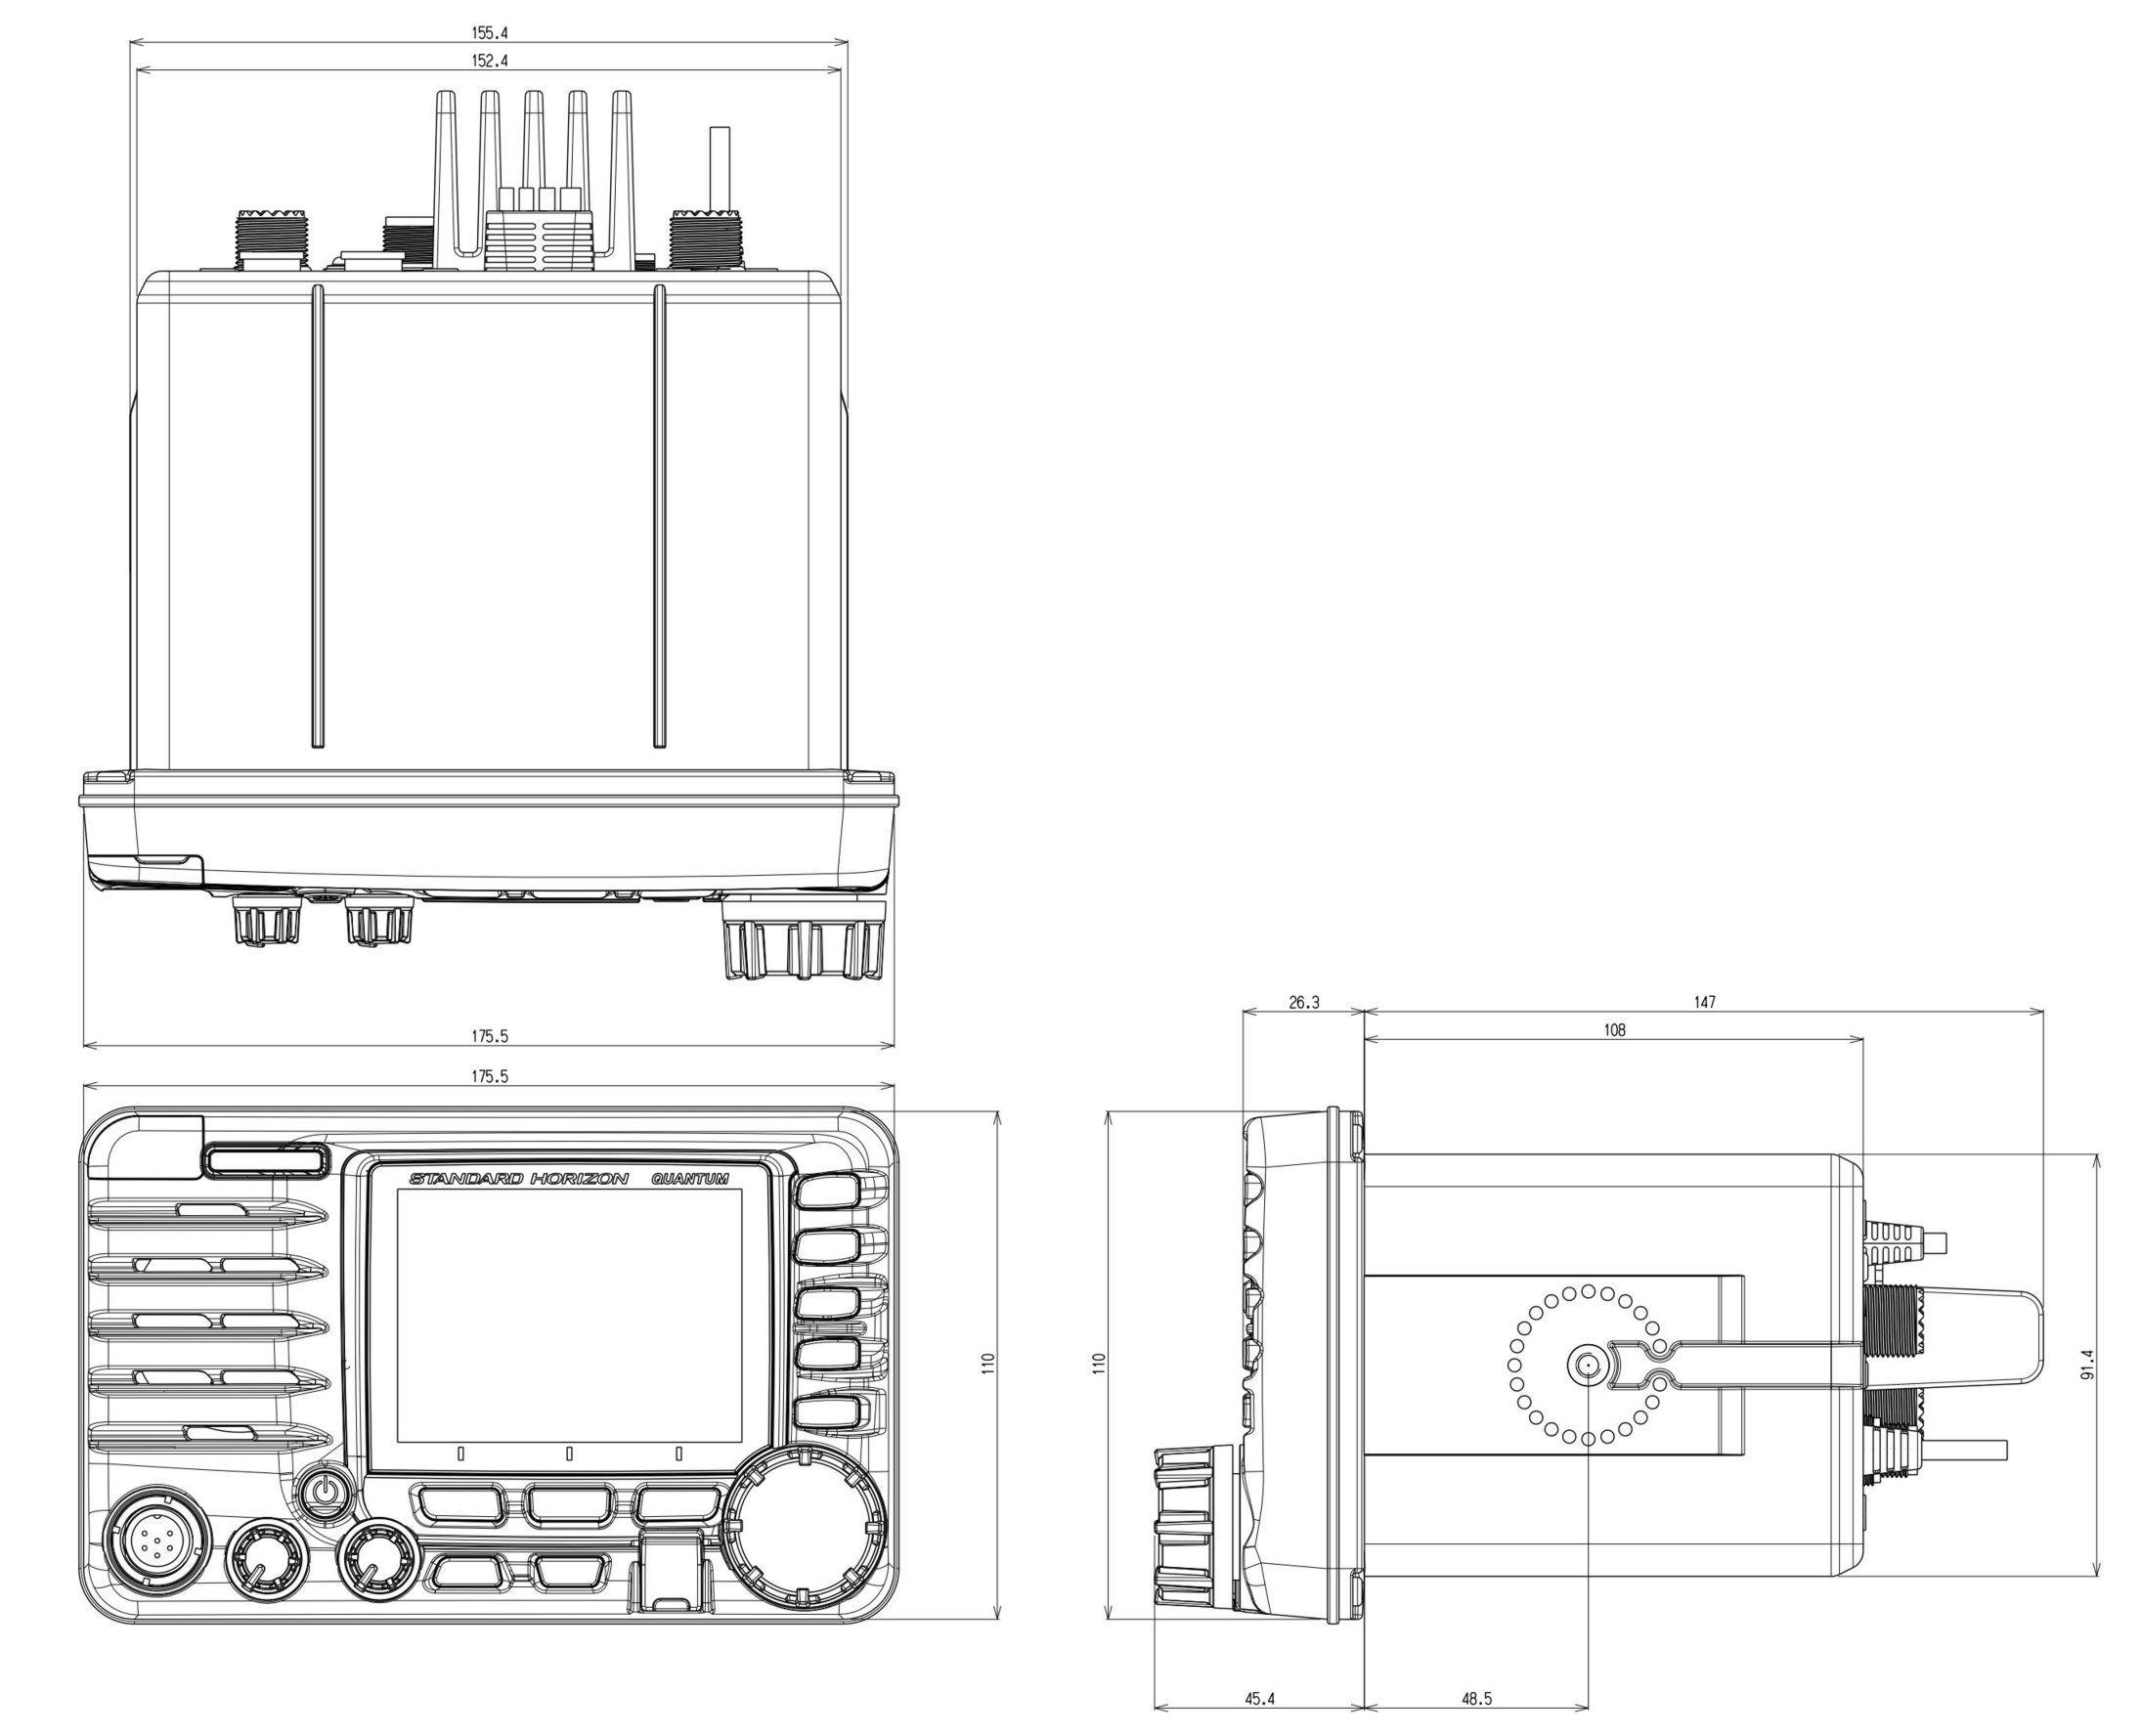 Panbo The Marine Electronics Hub Standard Horizon Gx A Loaded Vhf Radio Also Integrated